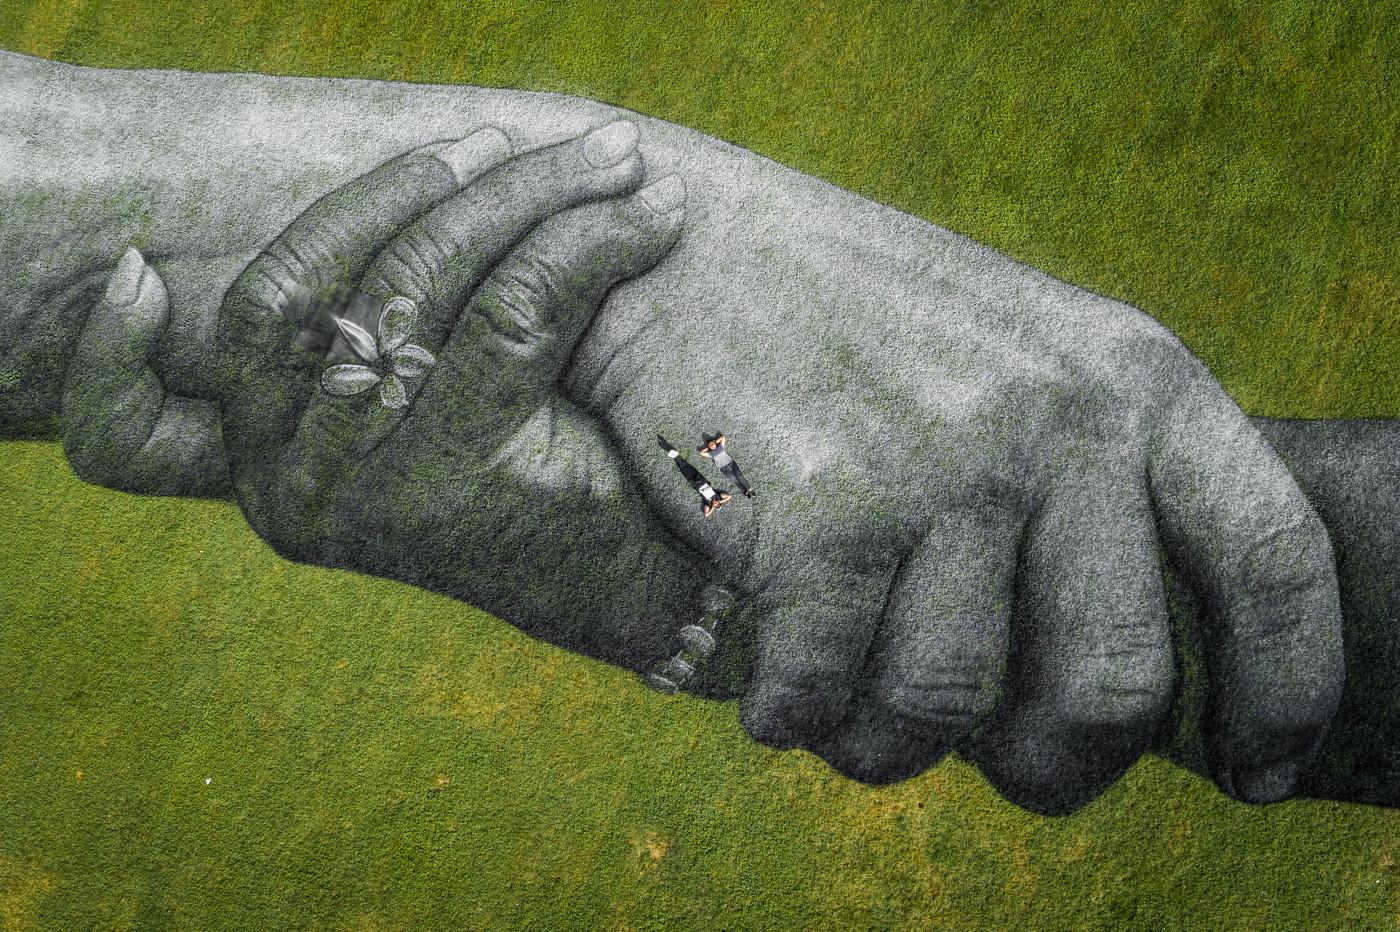 Beyond Walls Turin by Saype